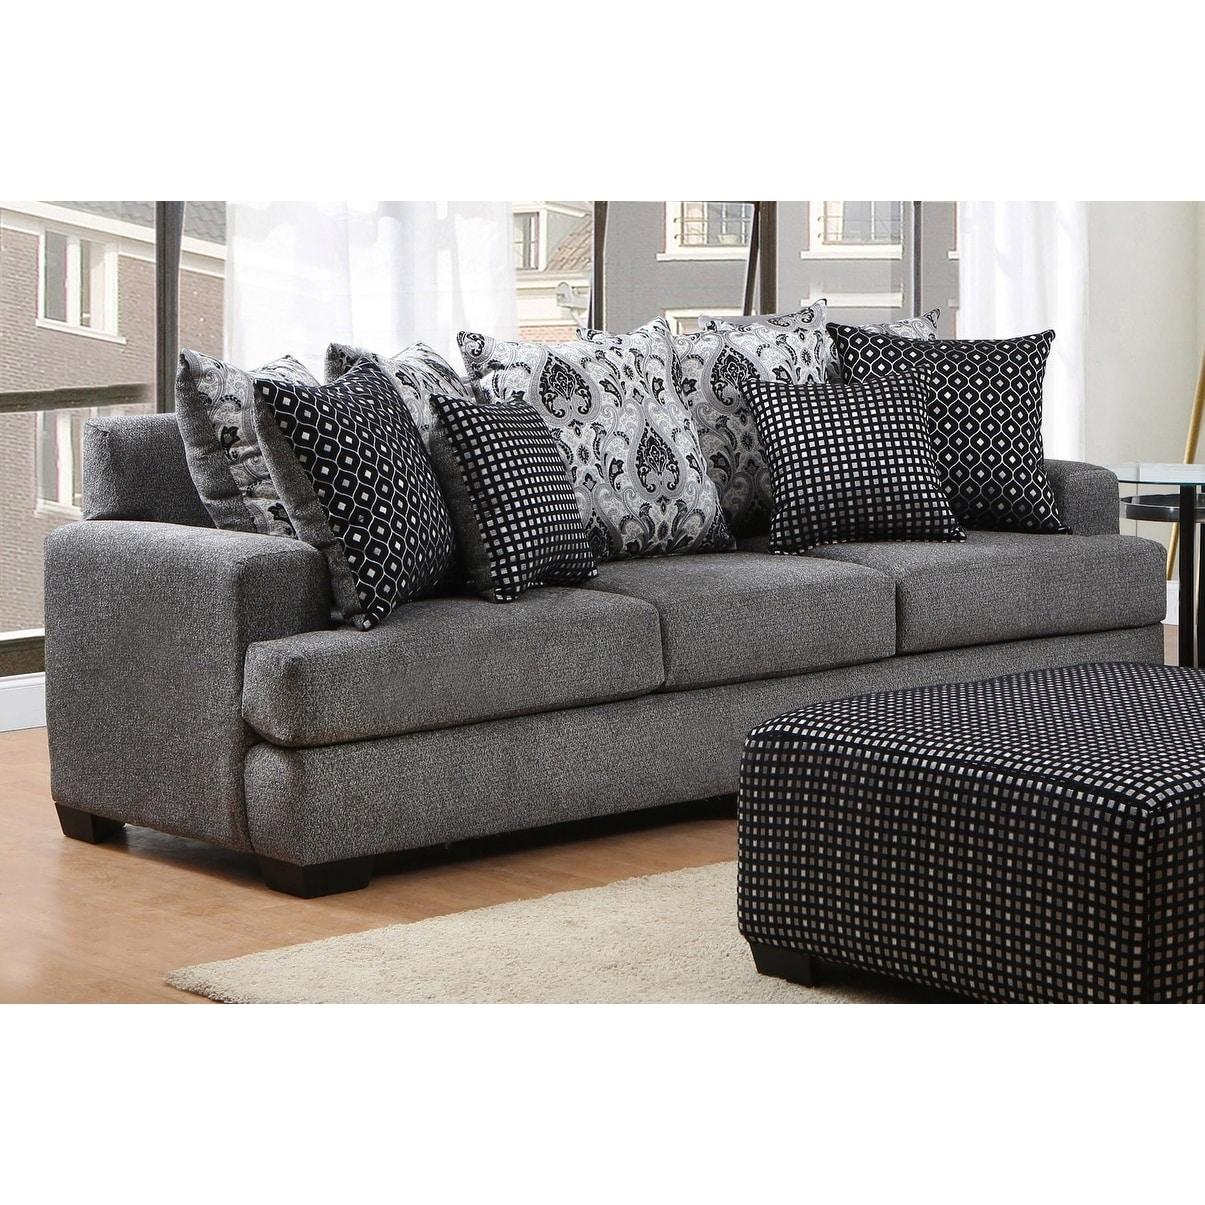 Cook Pathfinder Onyx Pillow Back Sofa